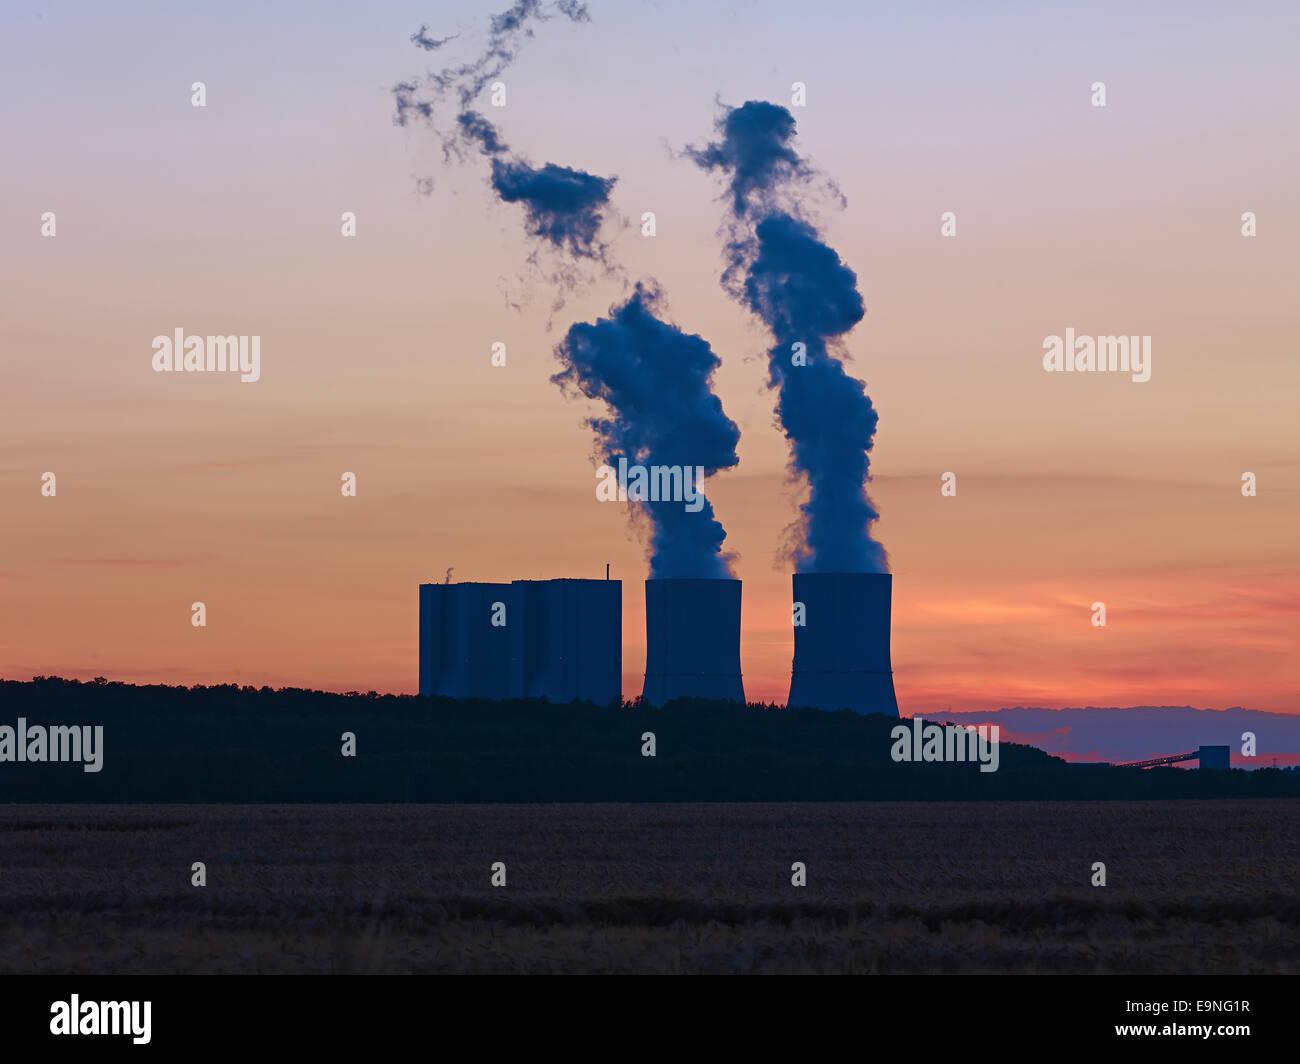 Lippendorf power plant, Saxony, Germany - Stock Image